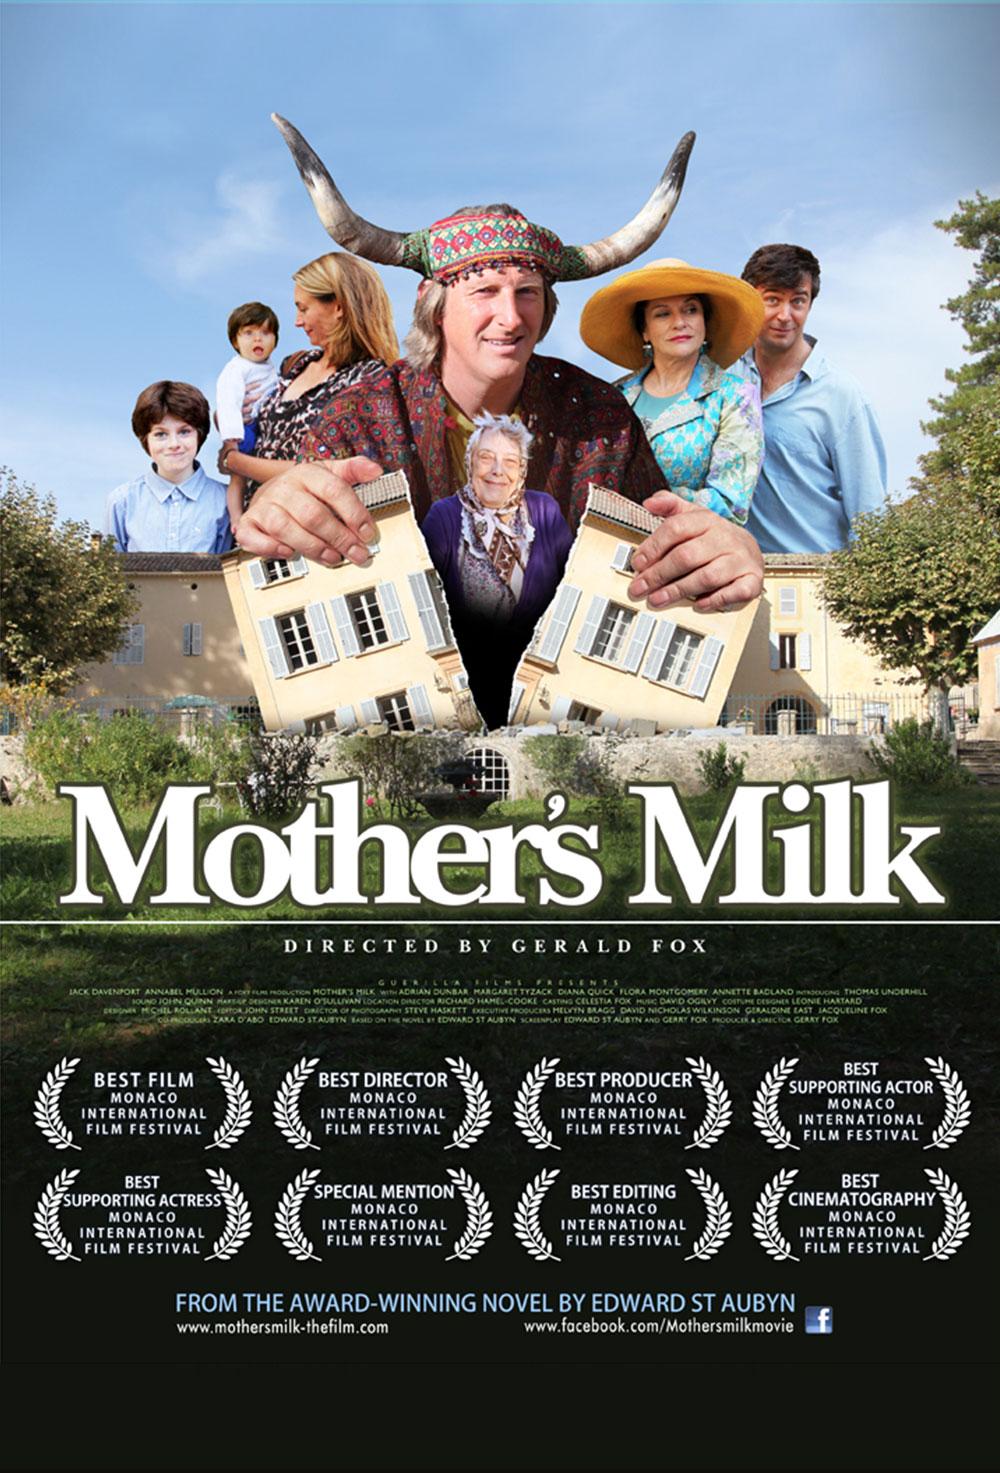 Mothers Milk poster